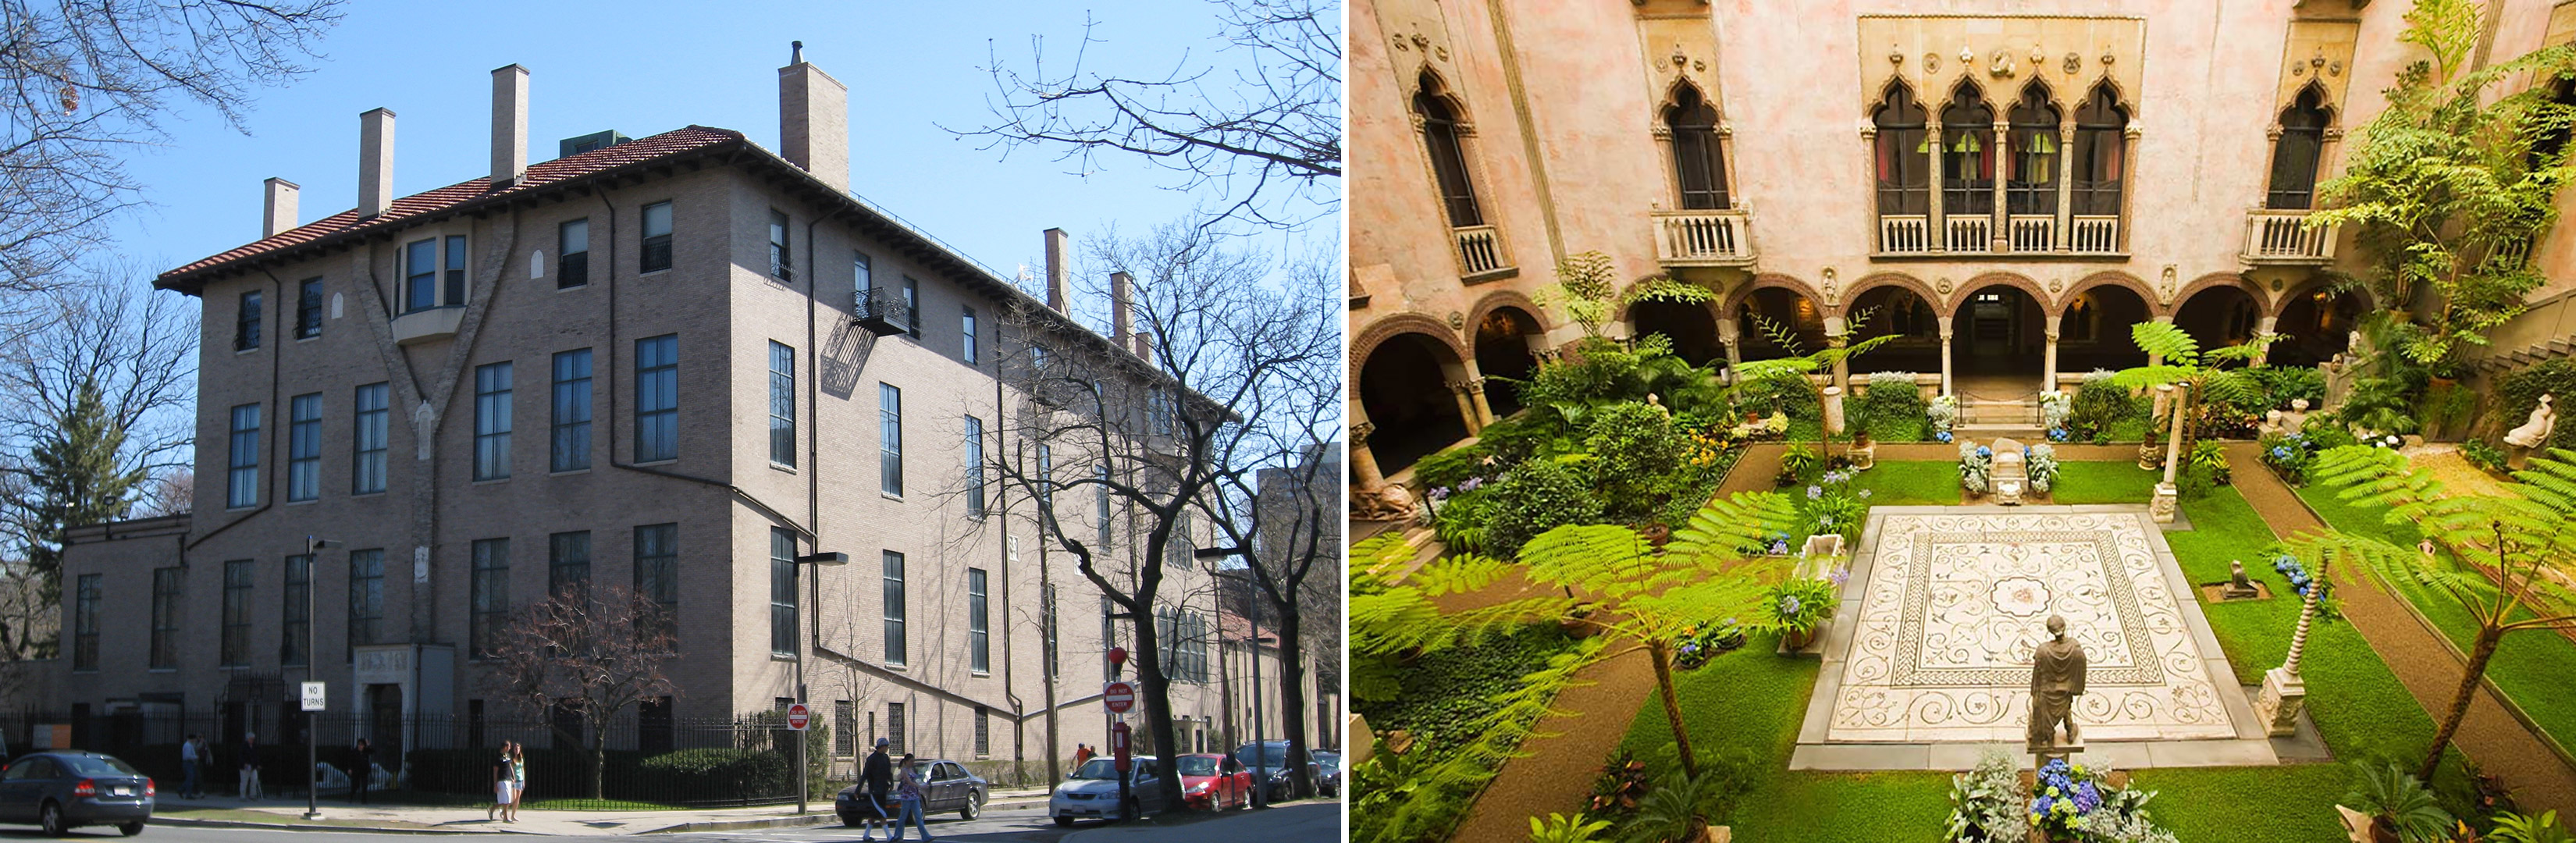 Frente y jardín del Museo Isabella Stewart Gardner